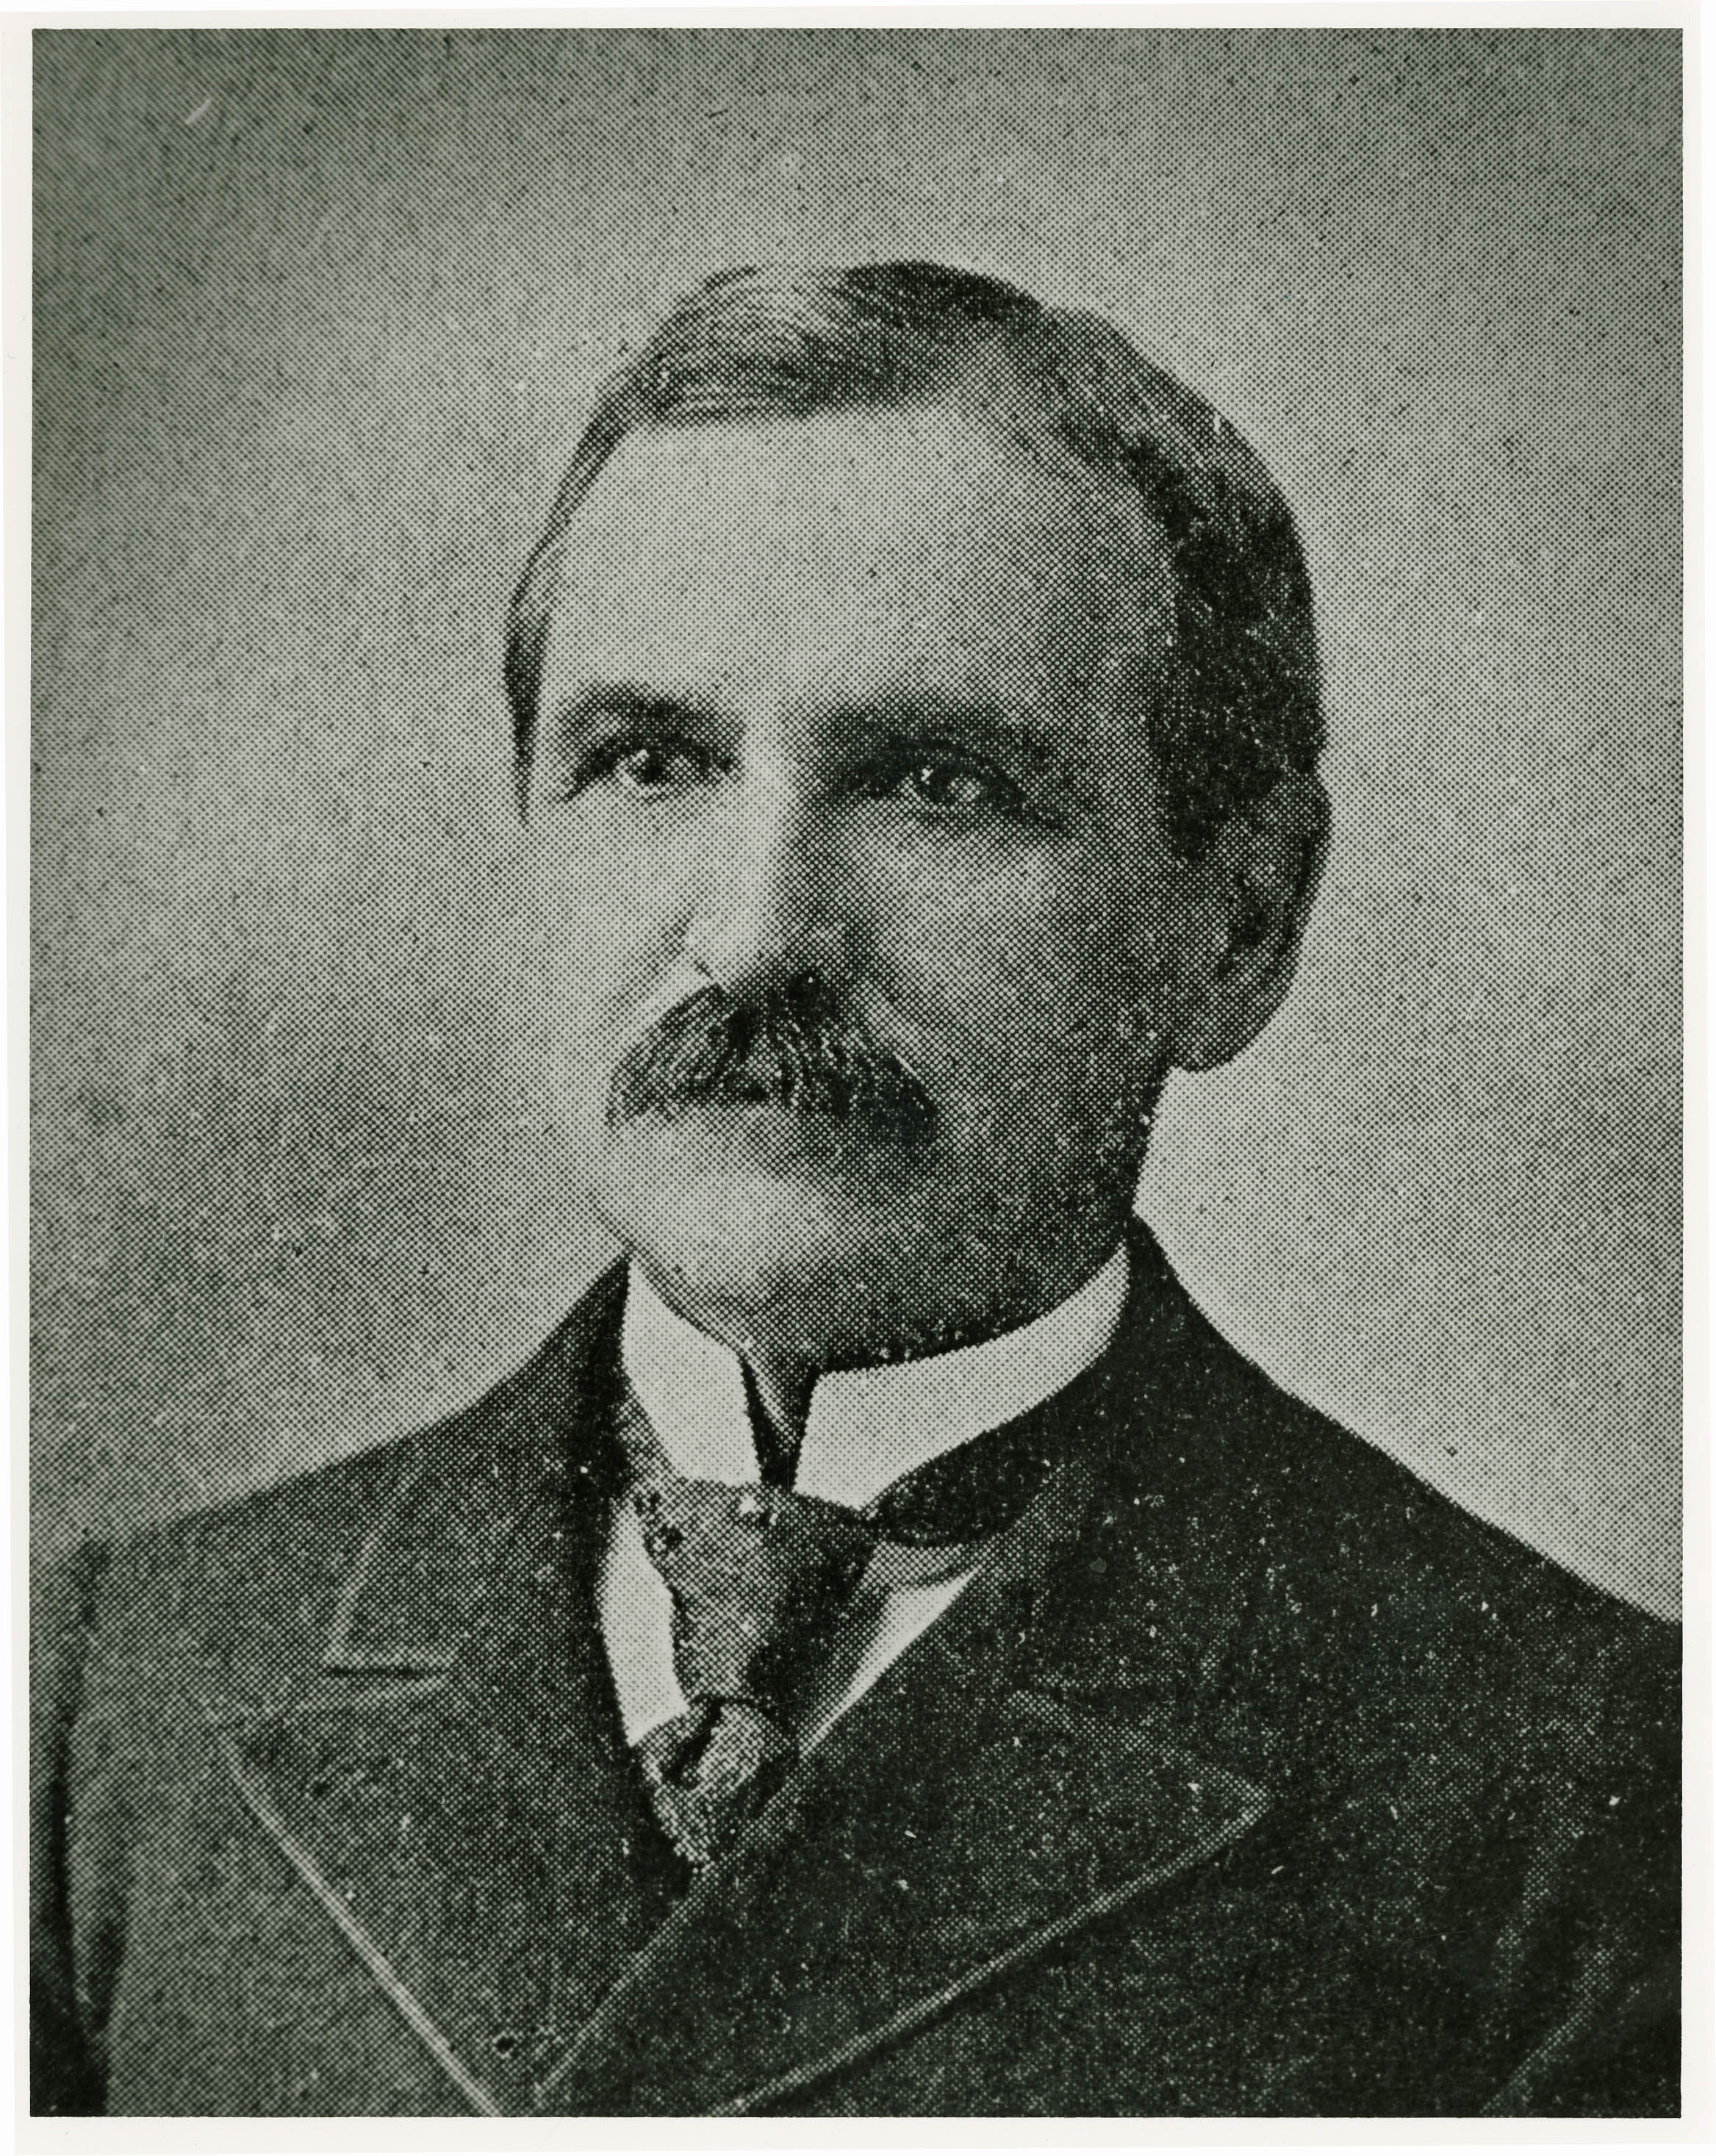 Portrait of Professor M.A. Holmes